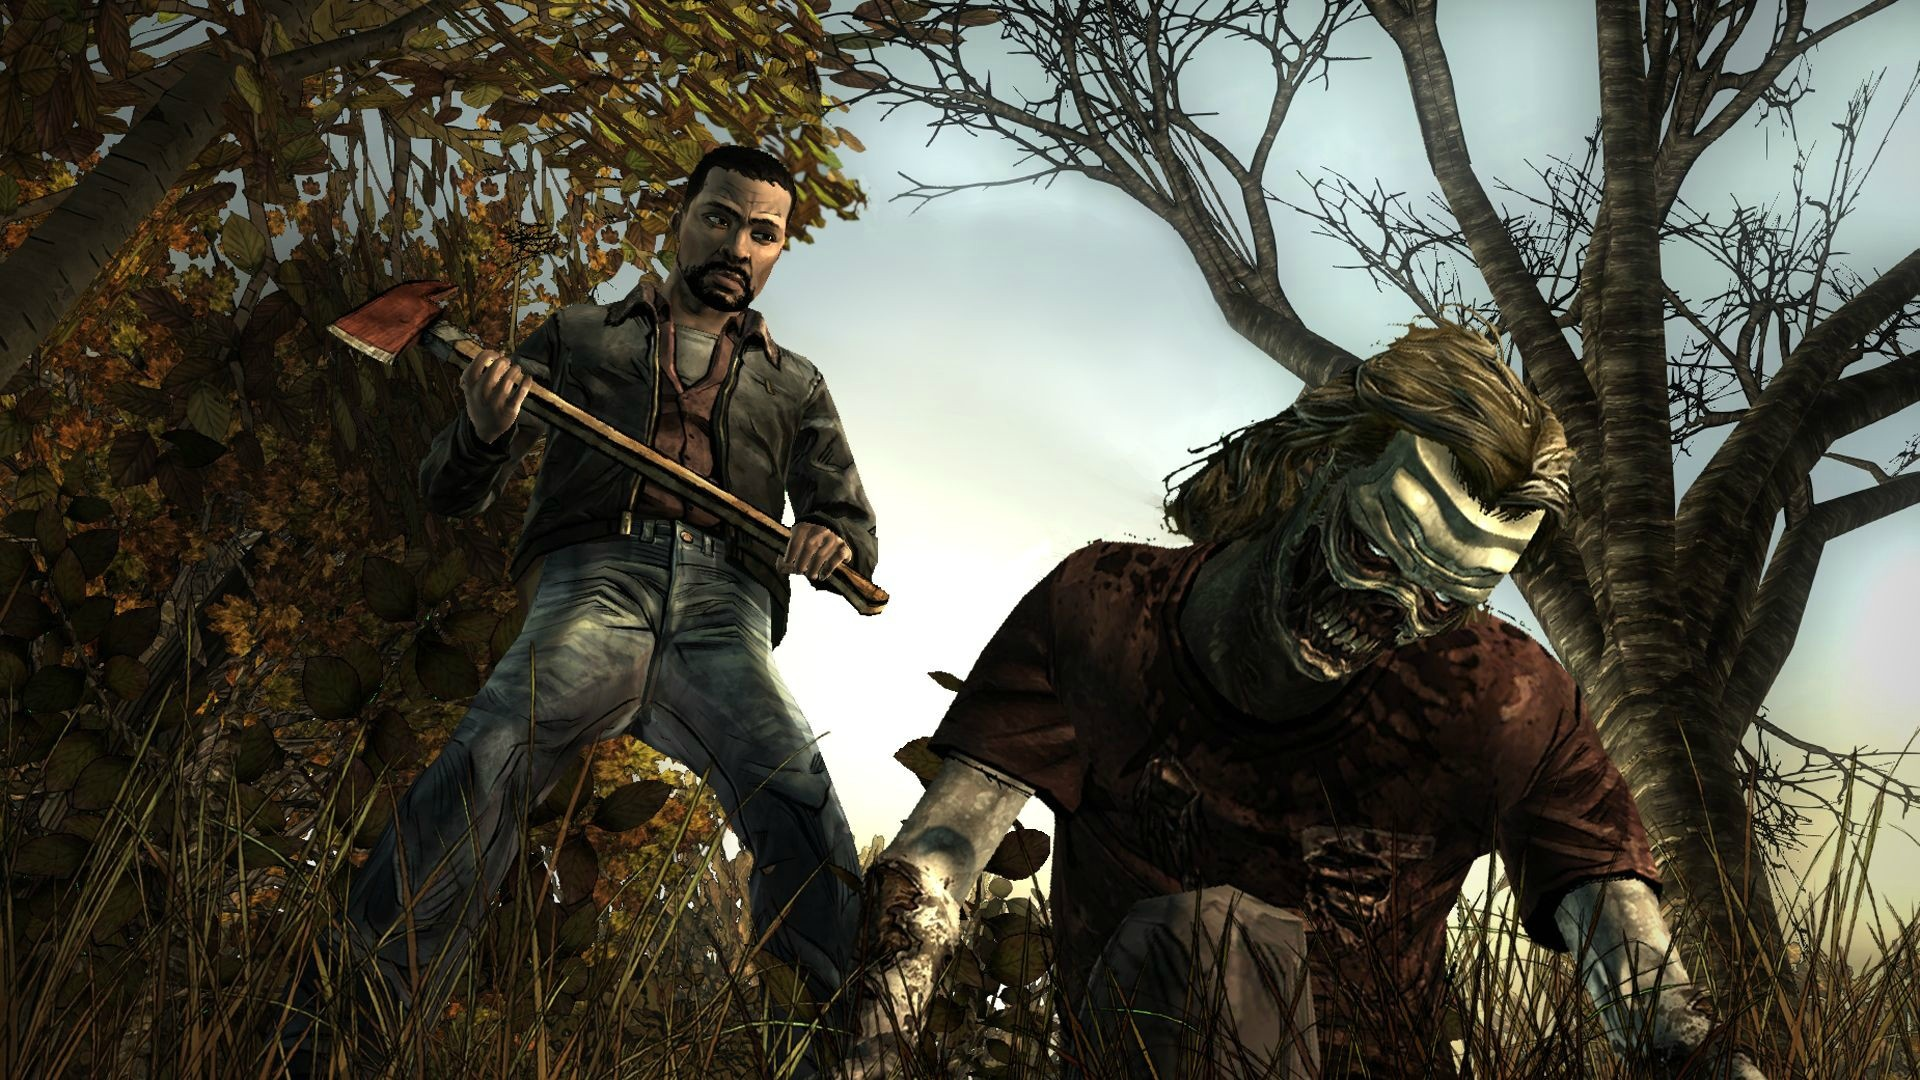 The walking dead game интерактивное кино